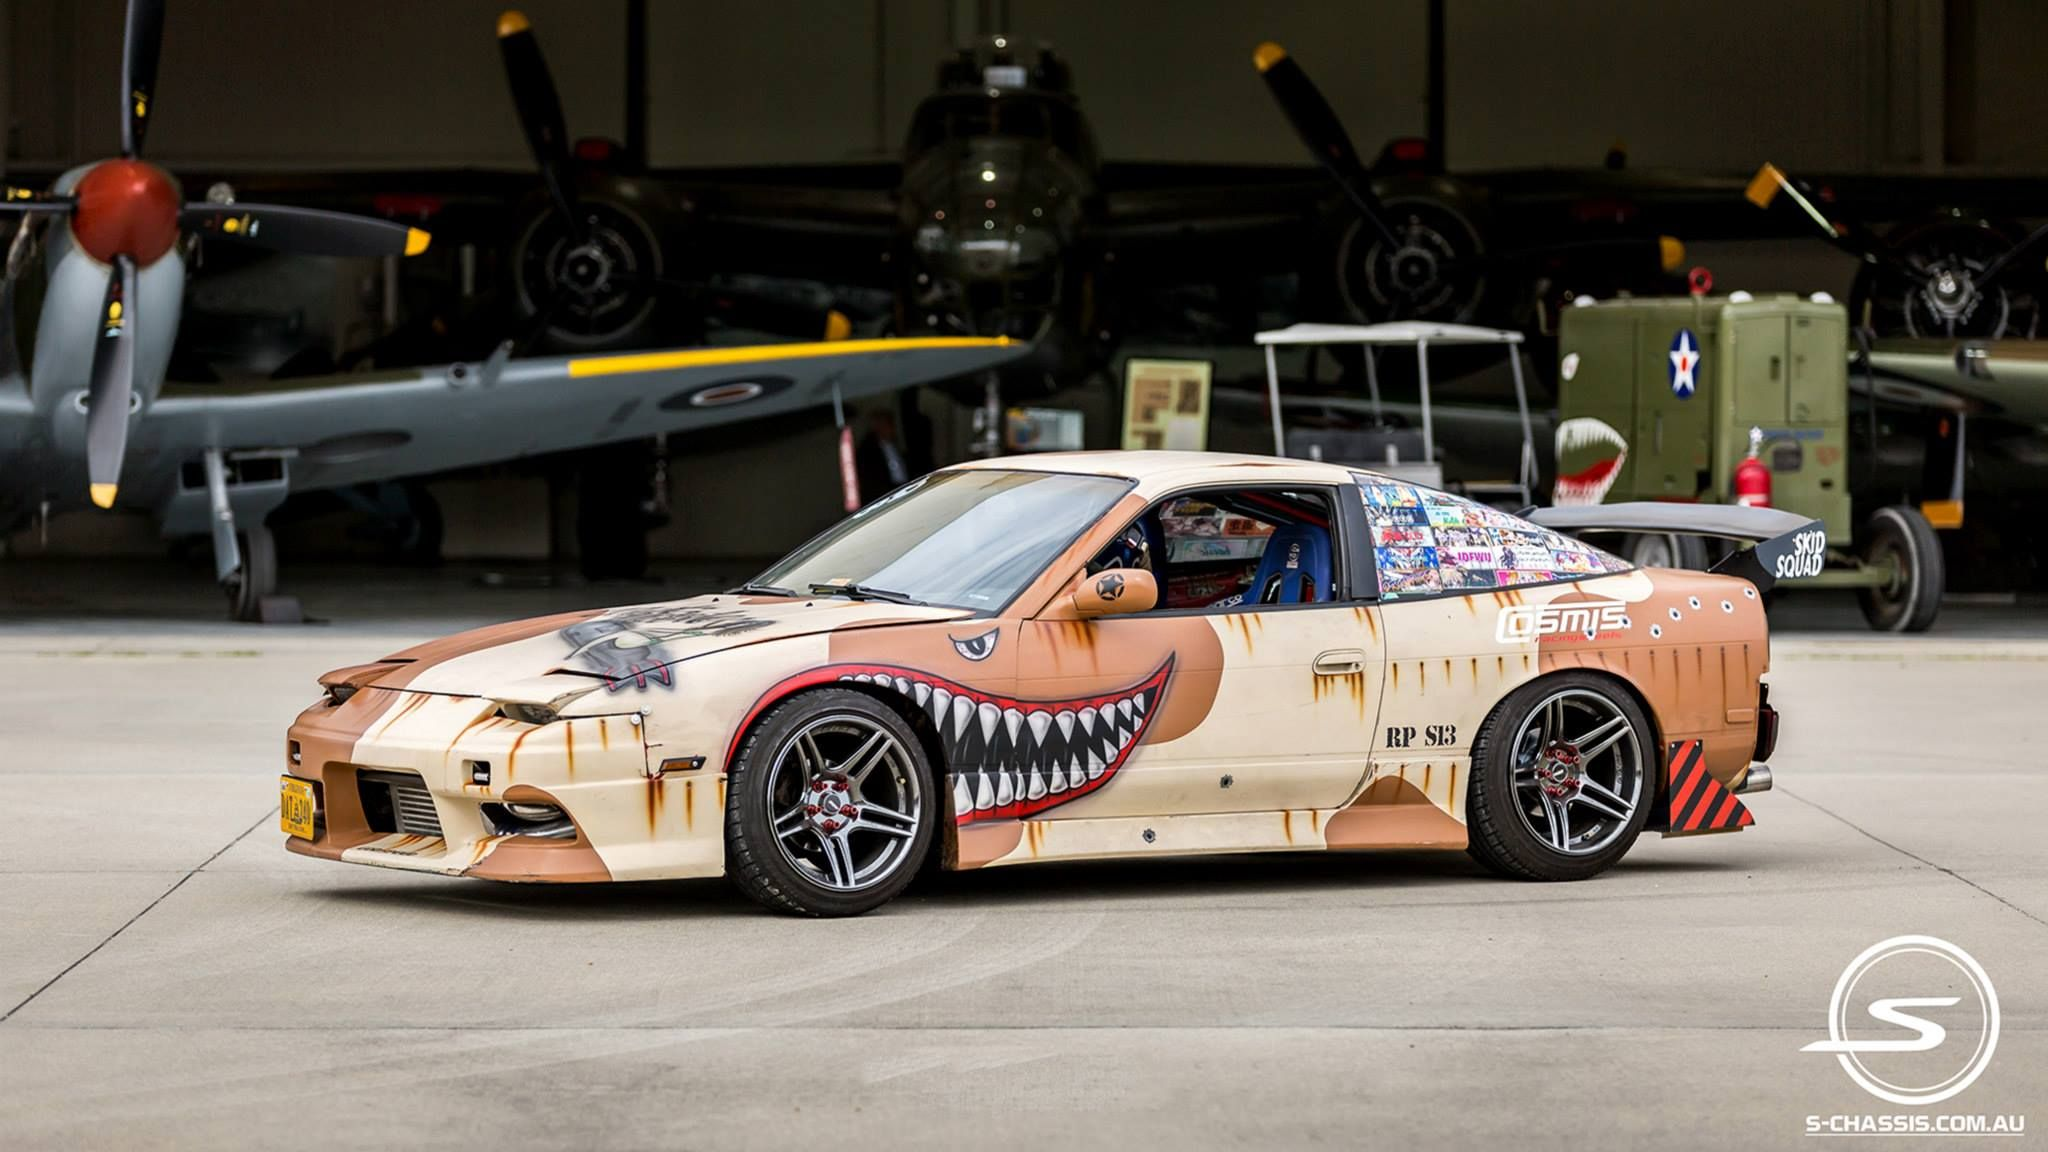 Camo, Wrapping, Vehicle Wraps, Auto Design, Ideas, Sticker, Paint, Wheels